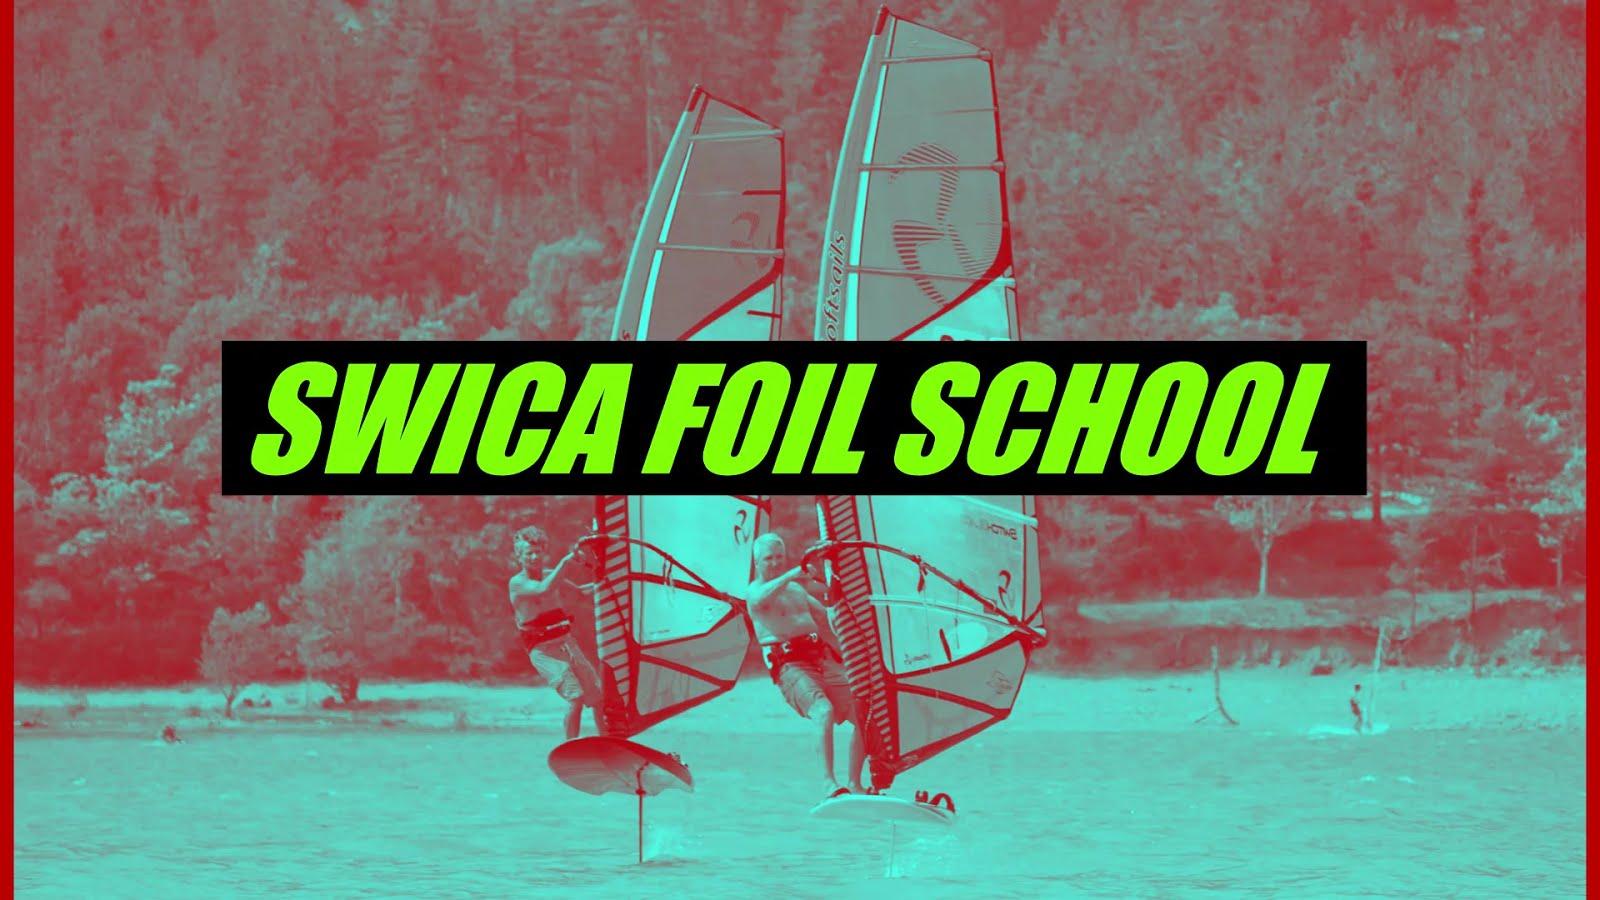 SWICA FOIL SCHOOL